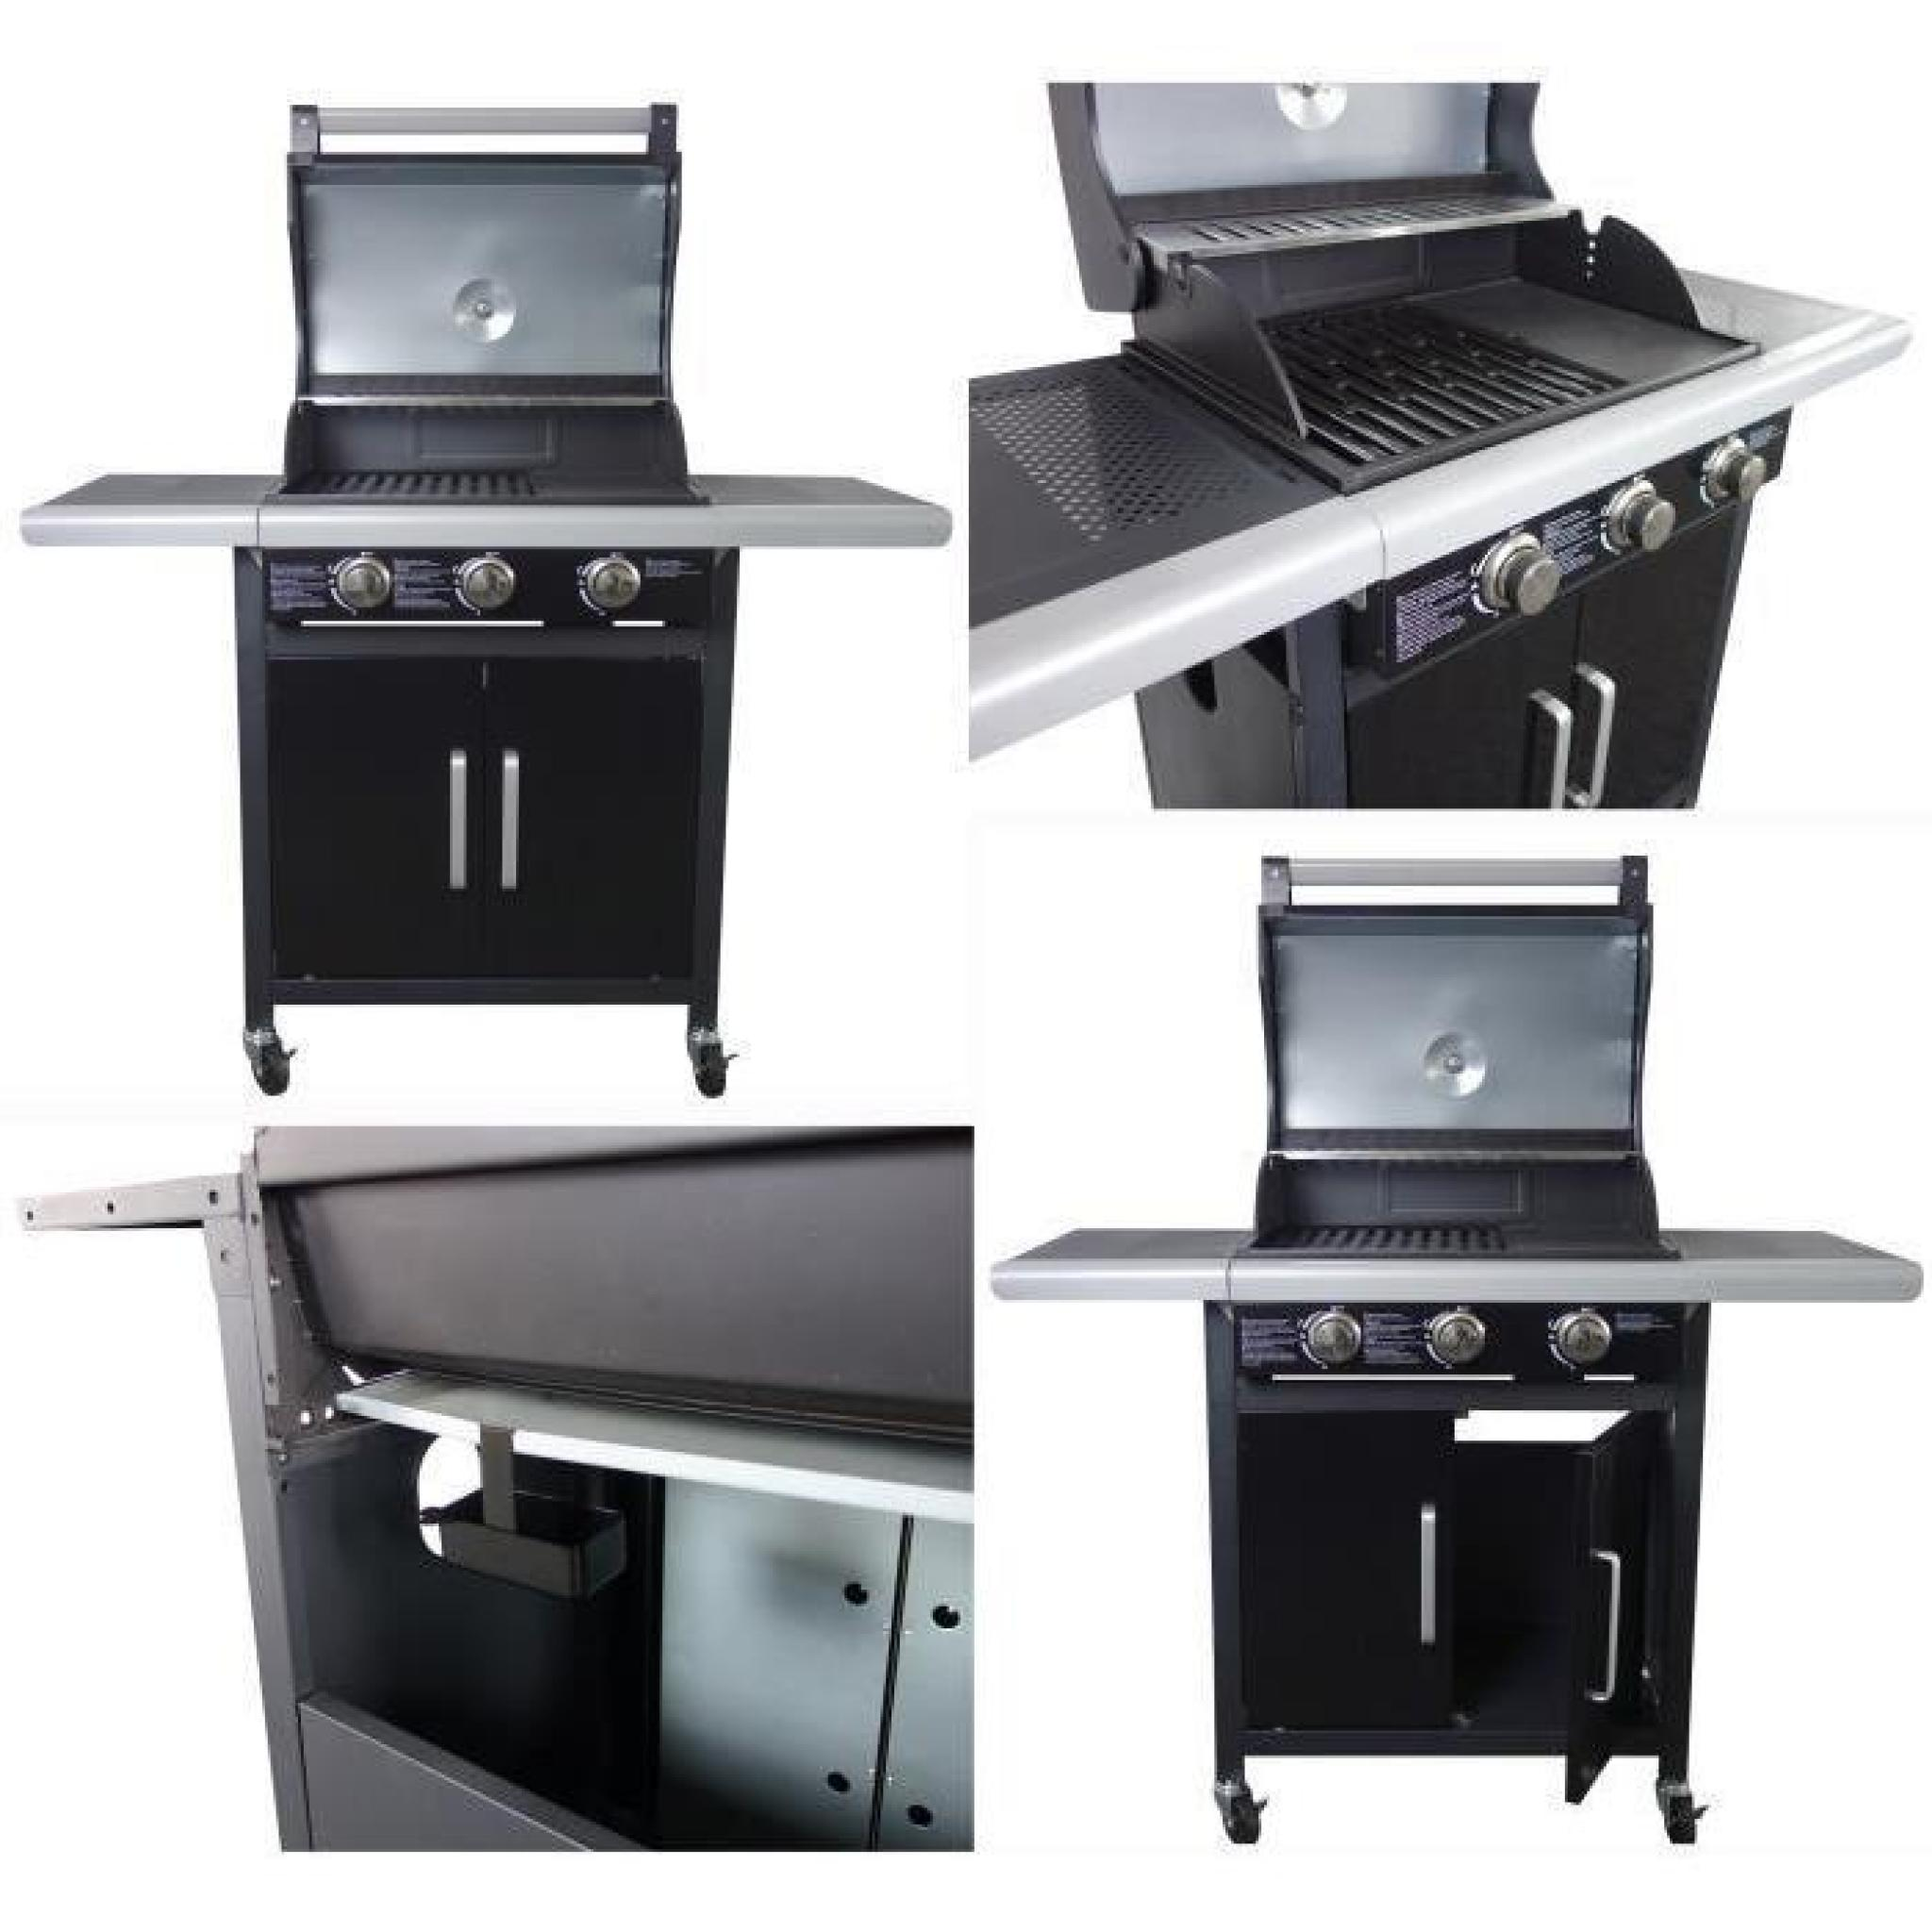 grill garden barbecue wave américain à gaz 3 brûle